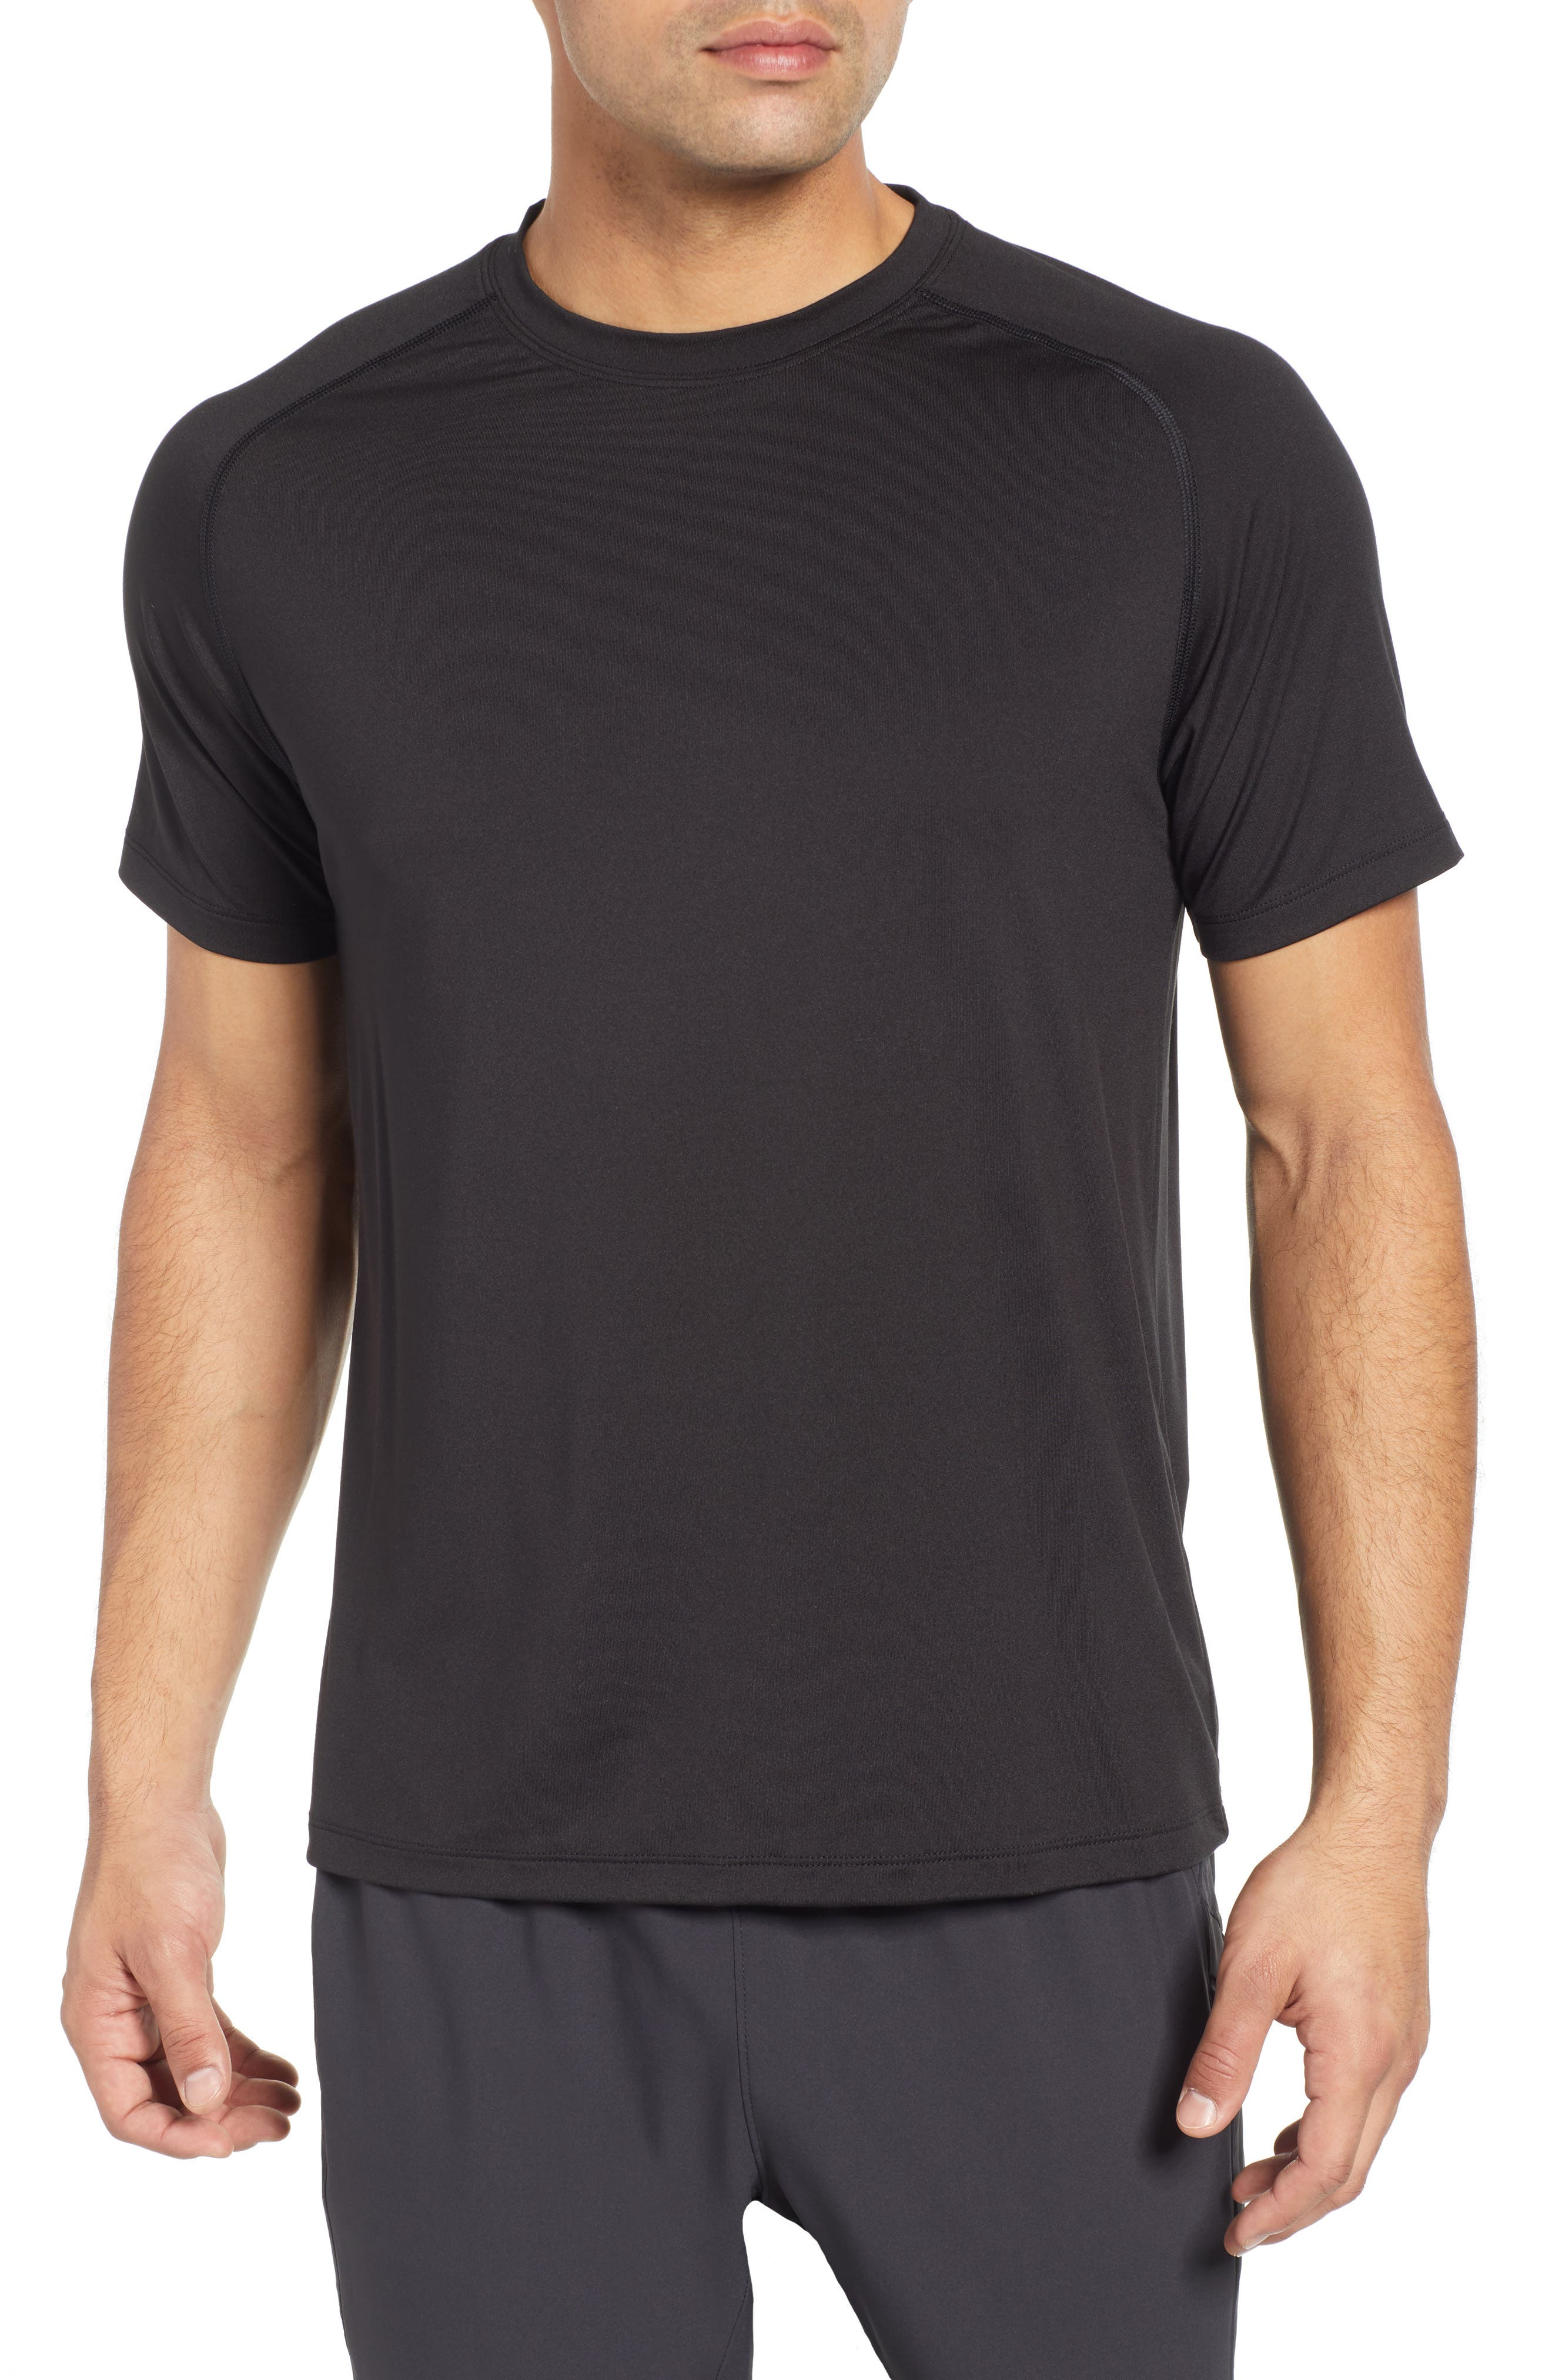 Rio Regular Fit Technical T-Shirt,                             Main thumbnail 1, color,                             BLACK